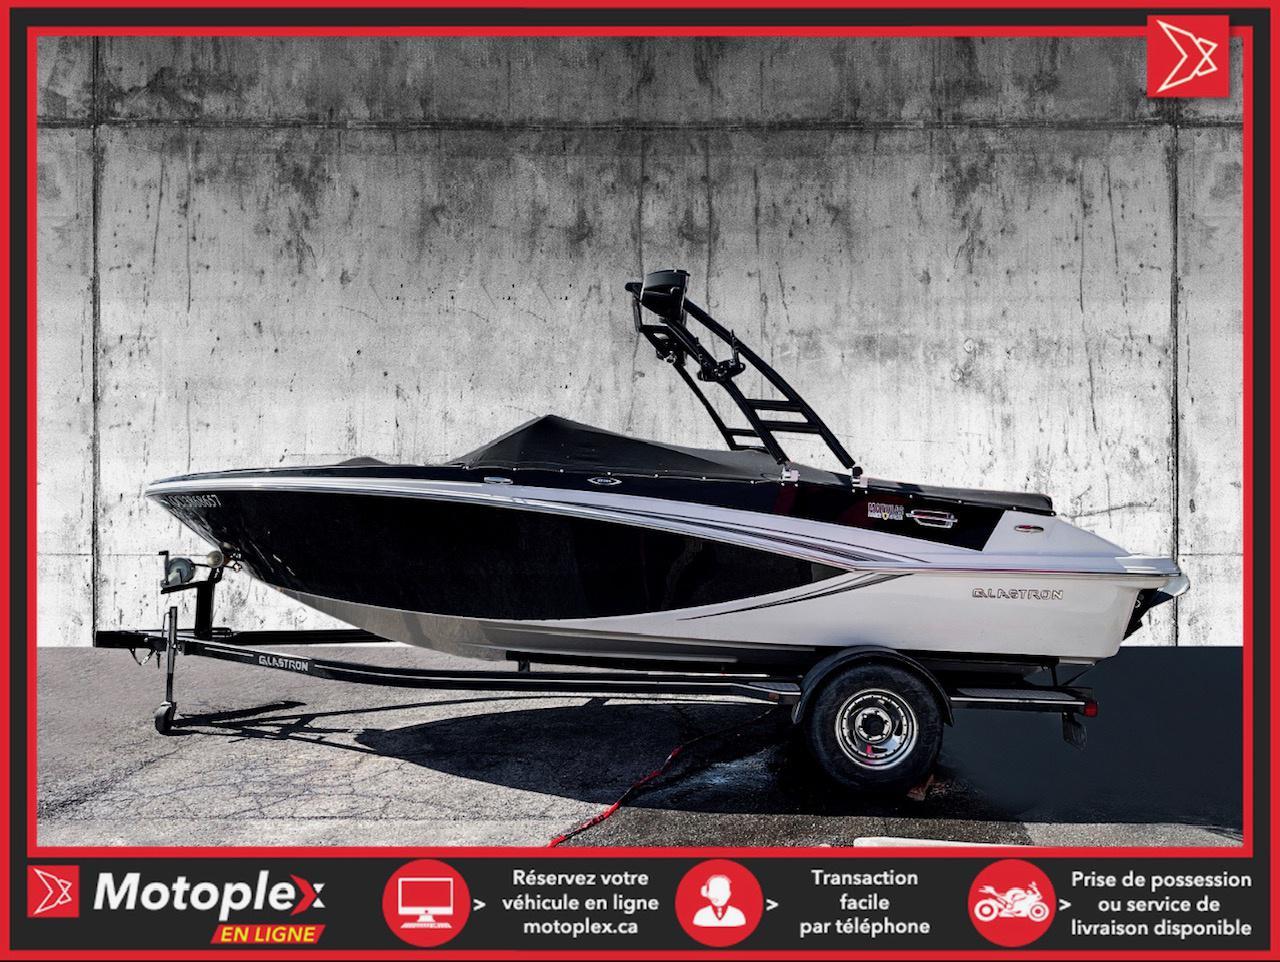 2013 GLASTRON GT 205 WAKE - 90$/SEMAINE